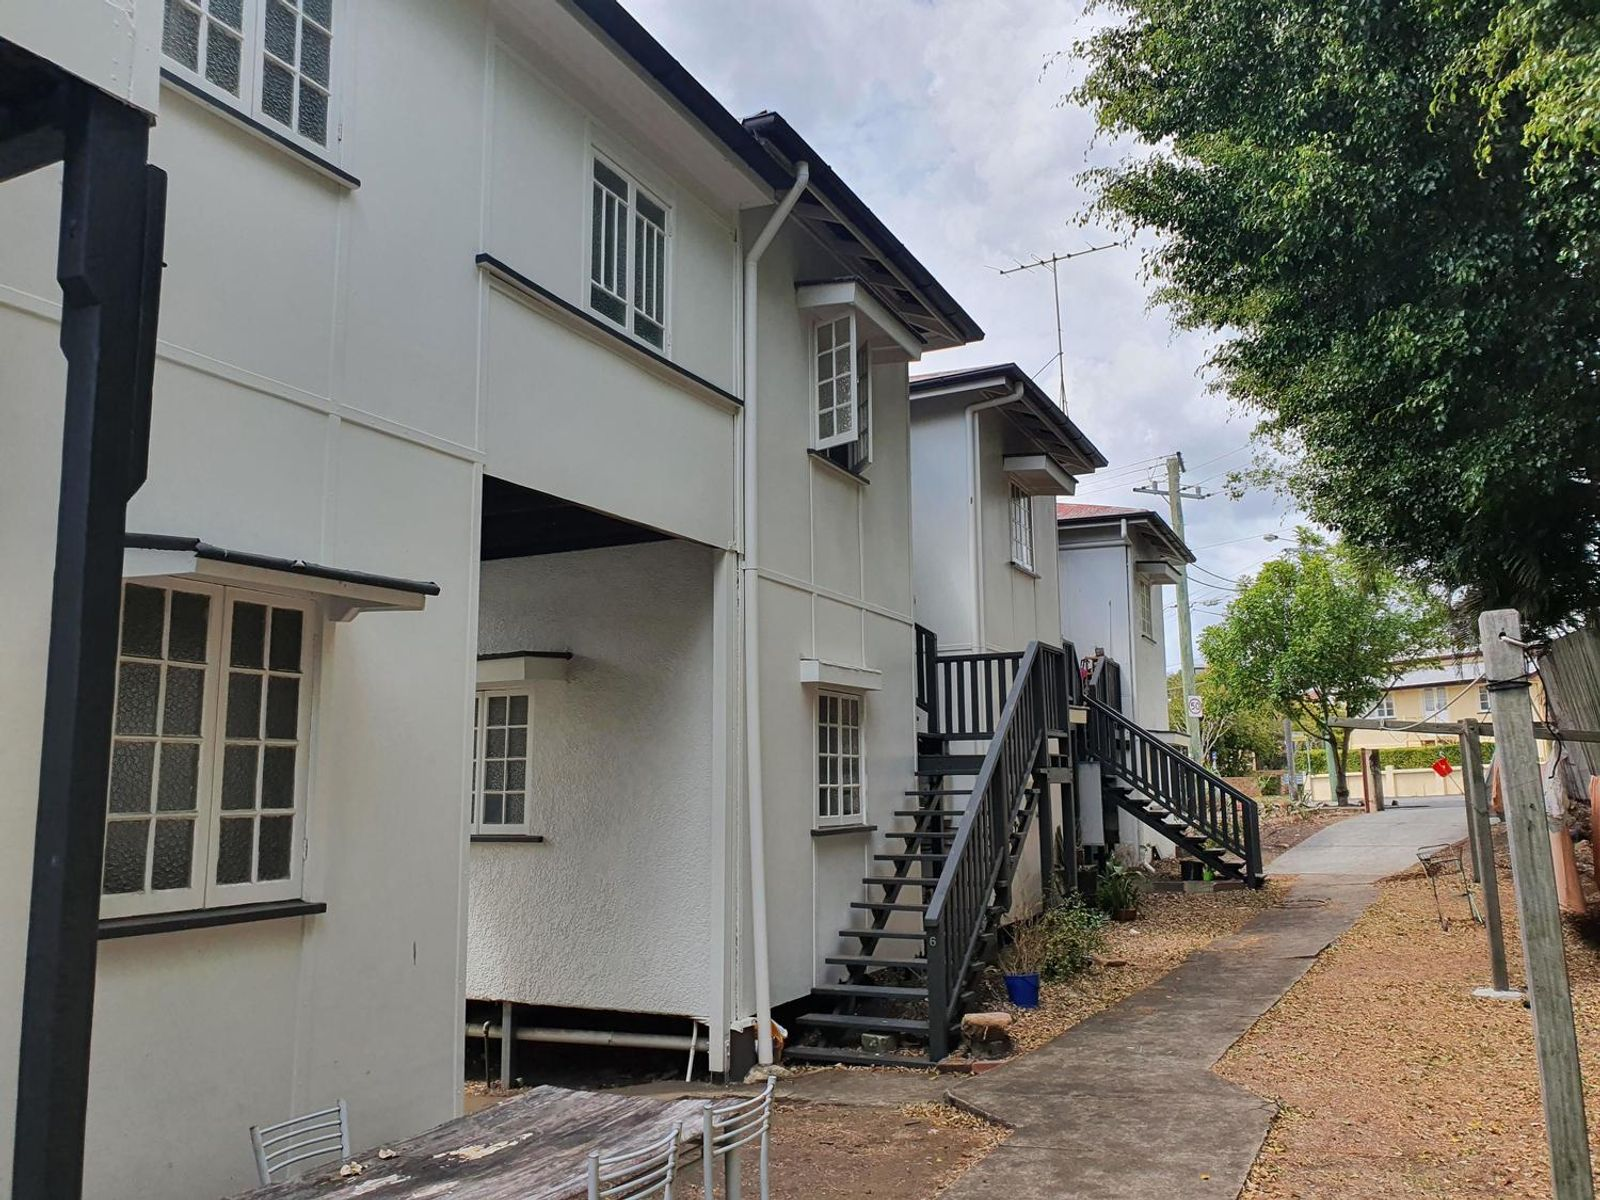 3/41 Besant Street, West End, QLD 4101